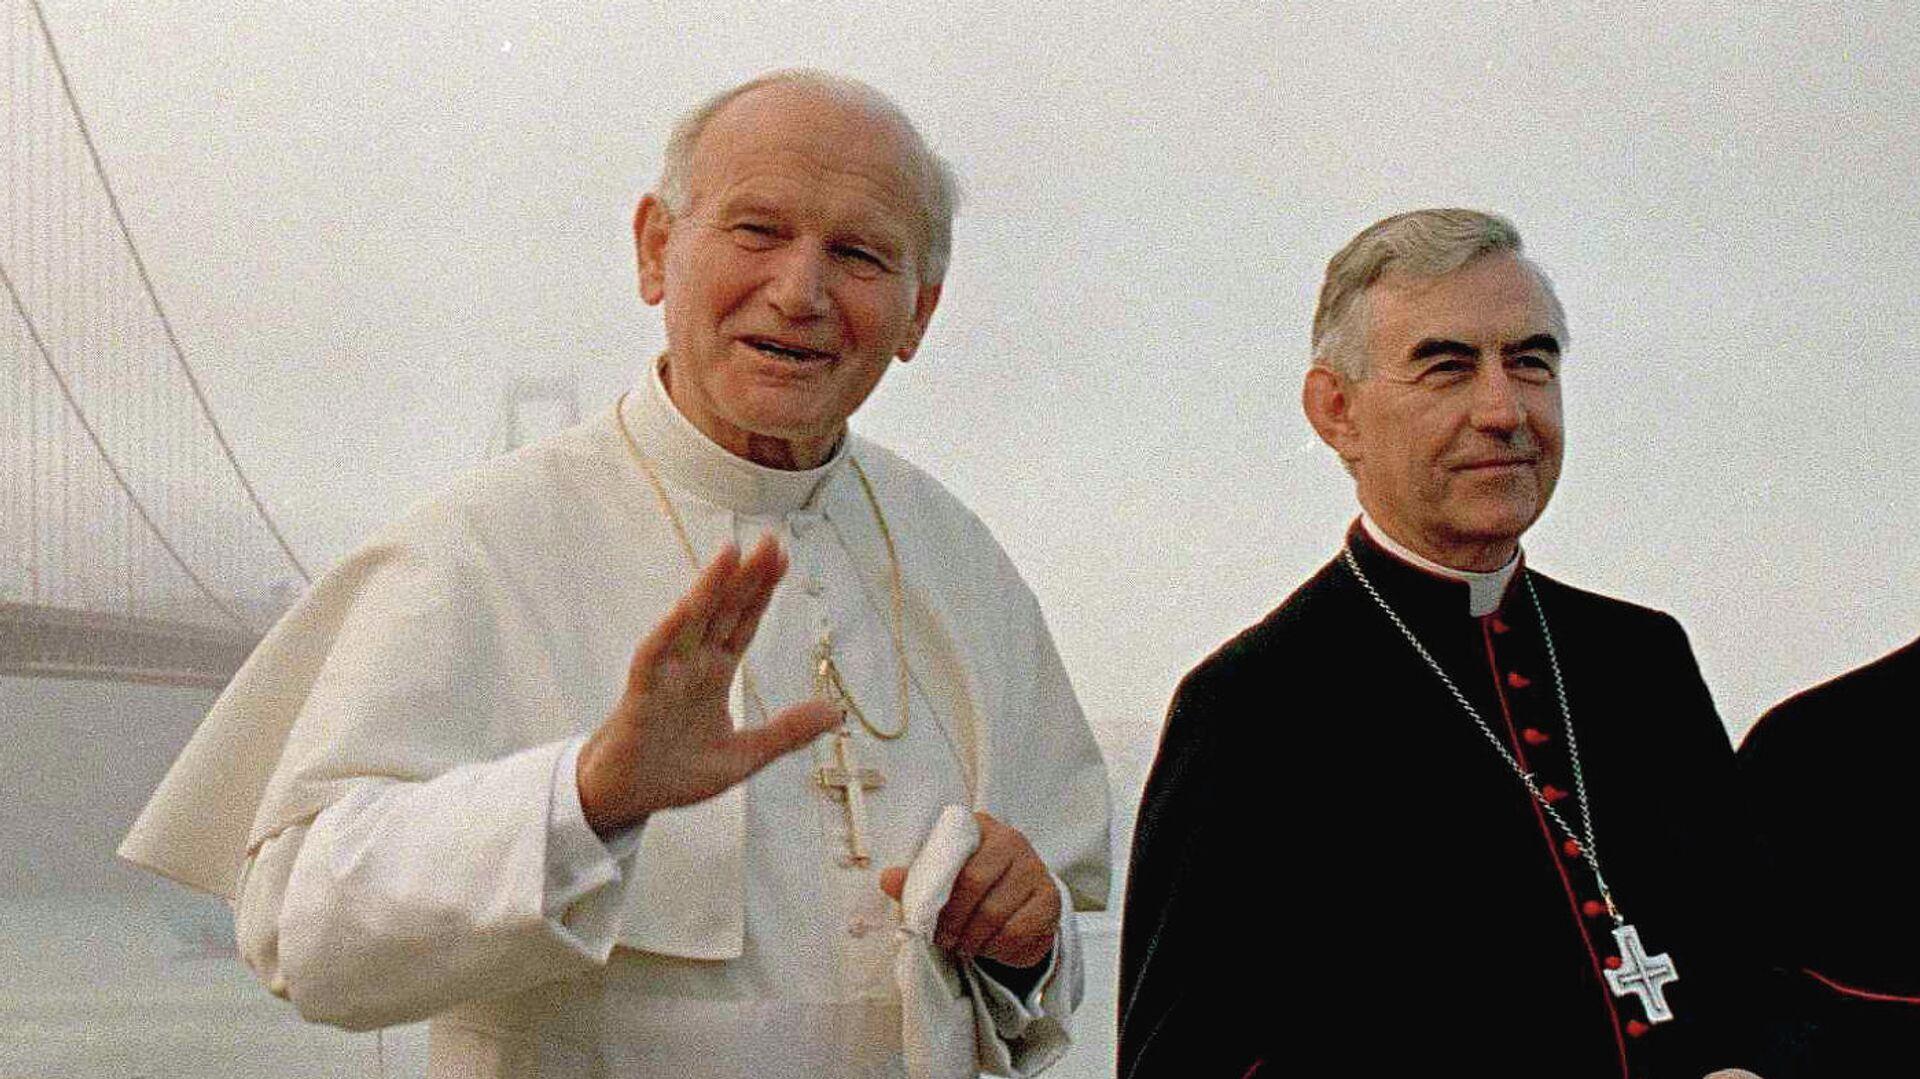 Папа Иоанн Павел II и кардинал Агостино Казароли в Сан-Франциско - РИА Новости, 1920, 13.09.2021